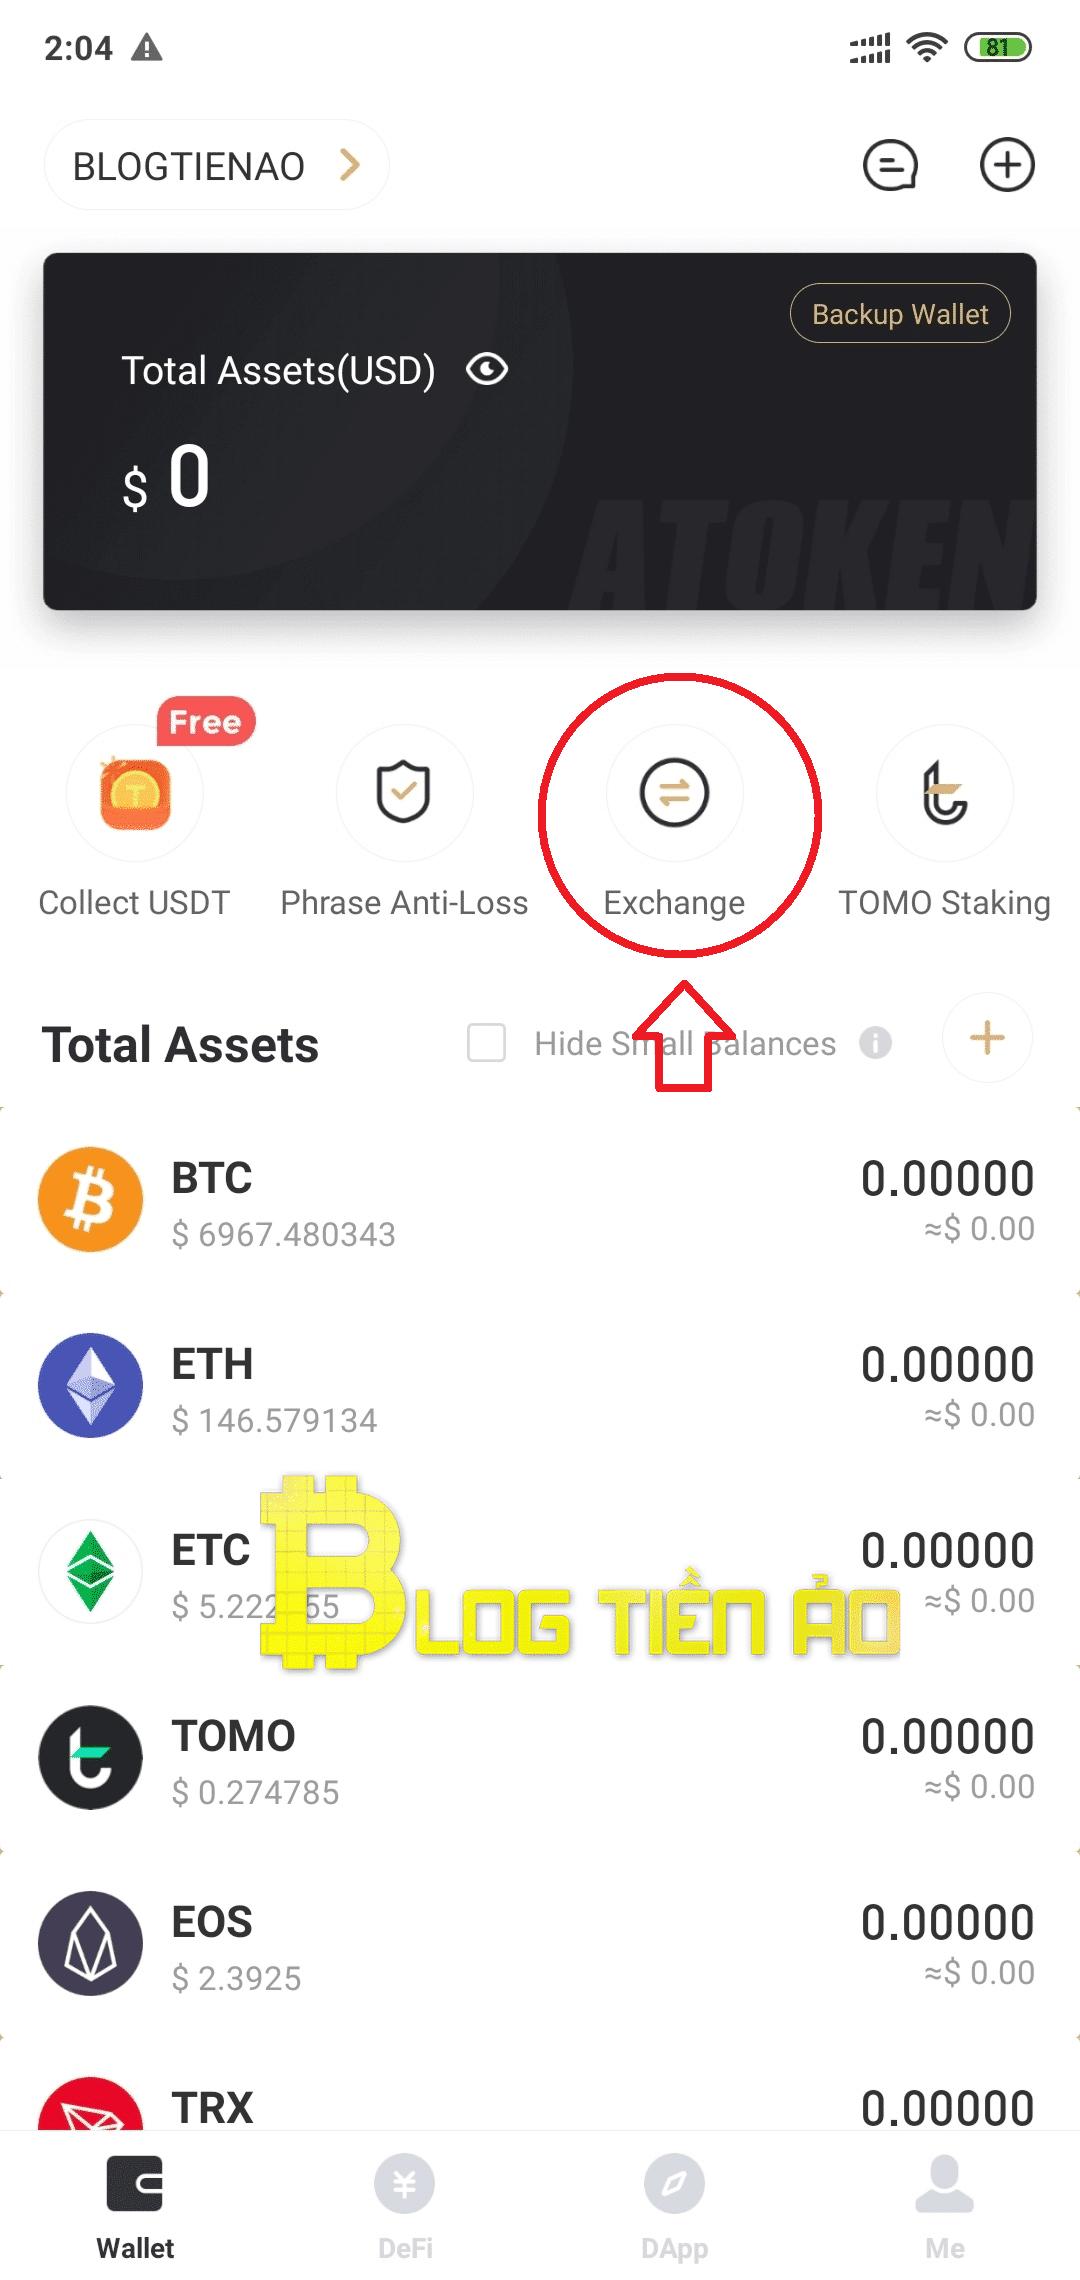 Use swap on the atoken wallet